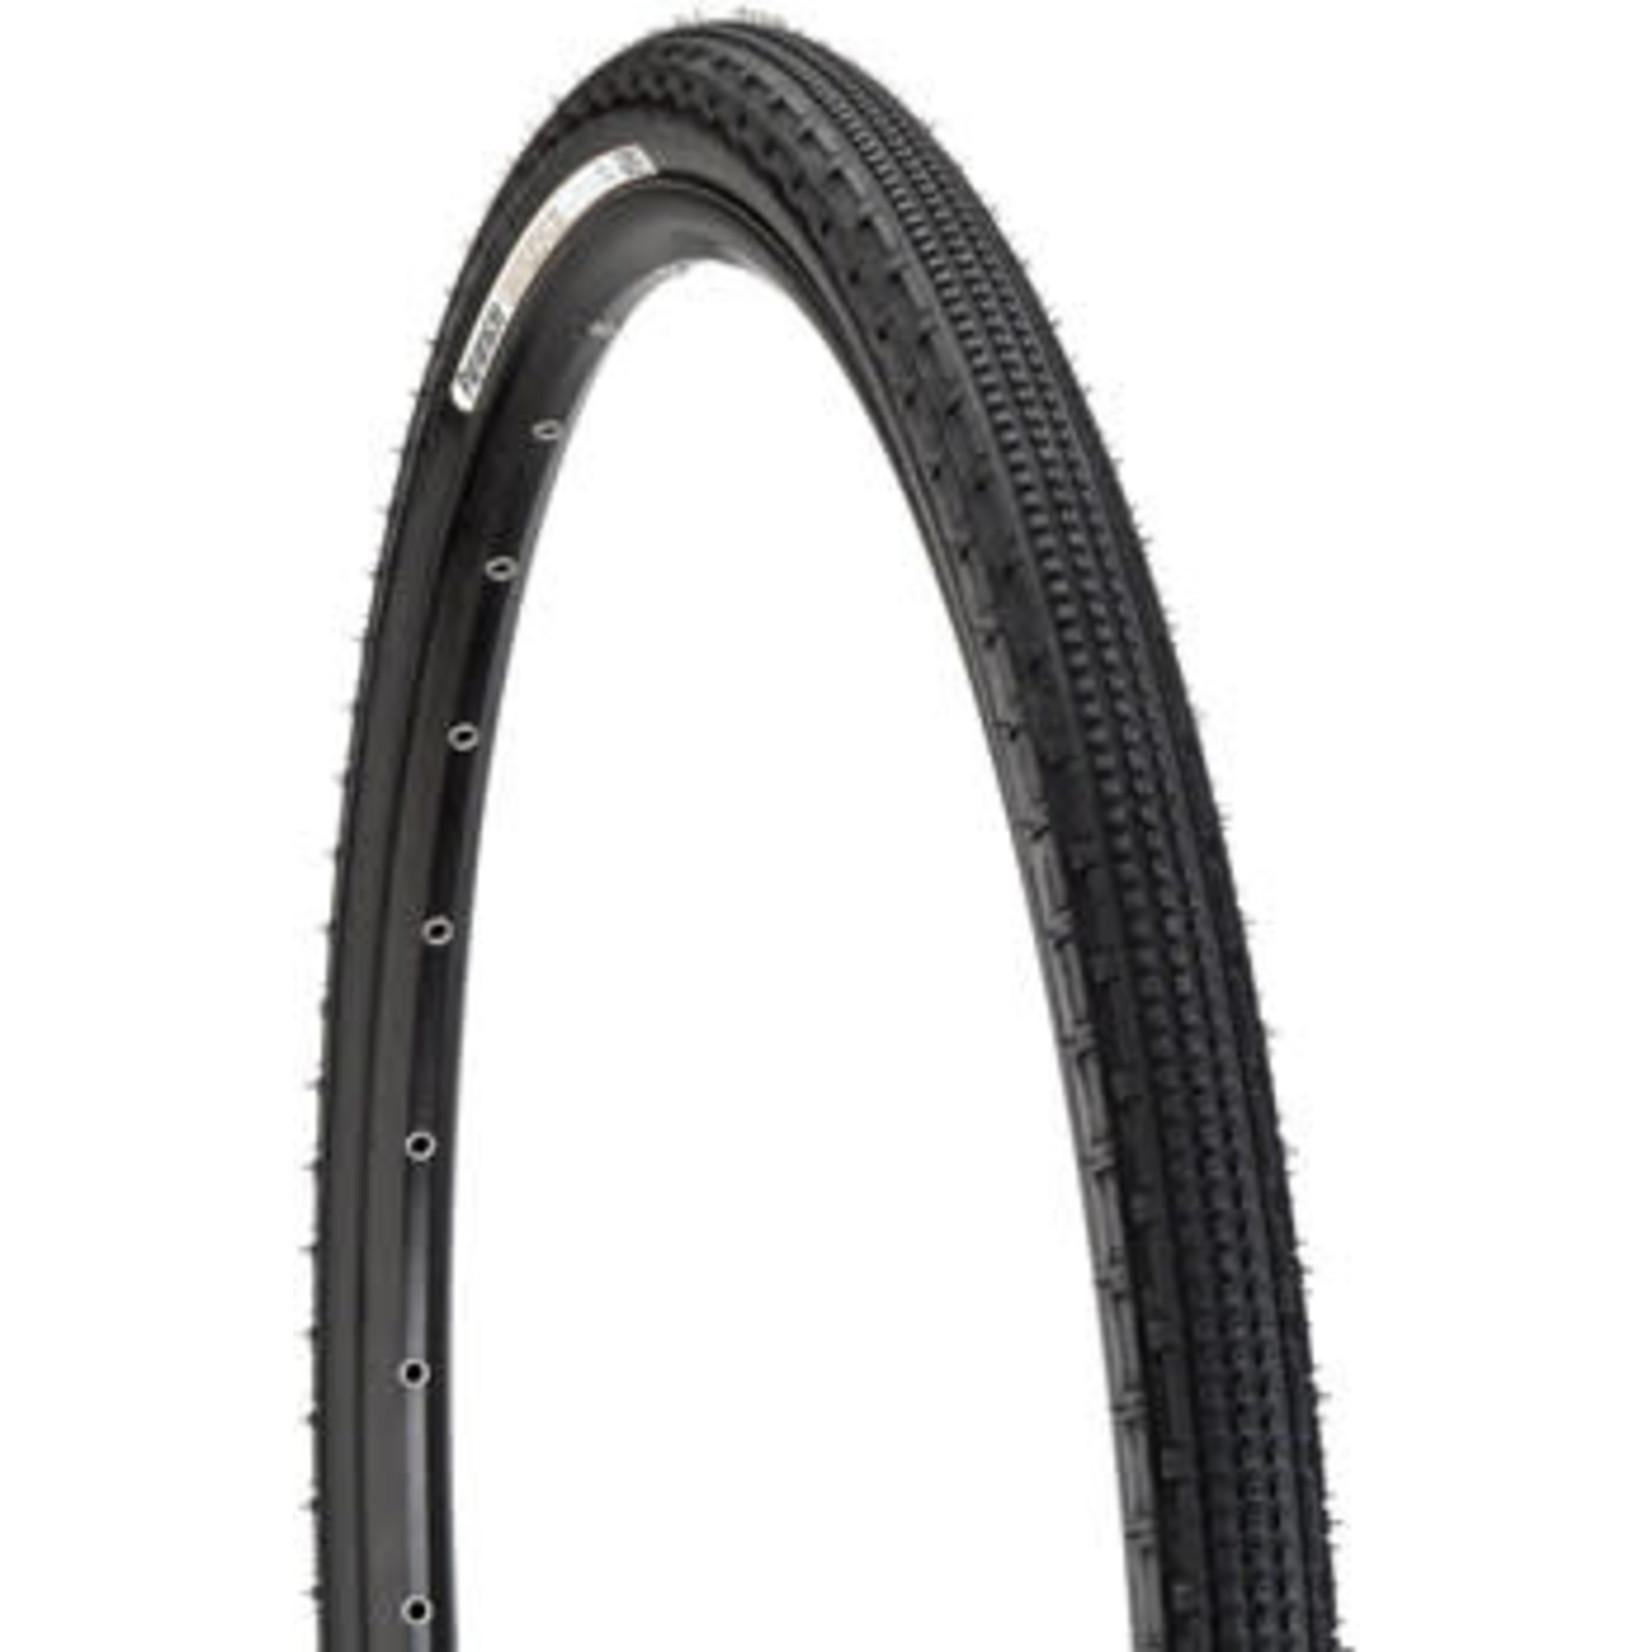 Panaracer Panaracer GravelKing SK 700 x 32 Folding Tire Semi-Knobby Tread Black